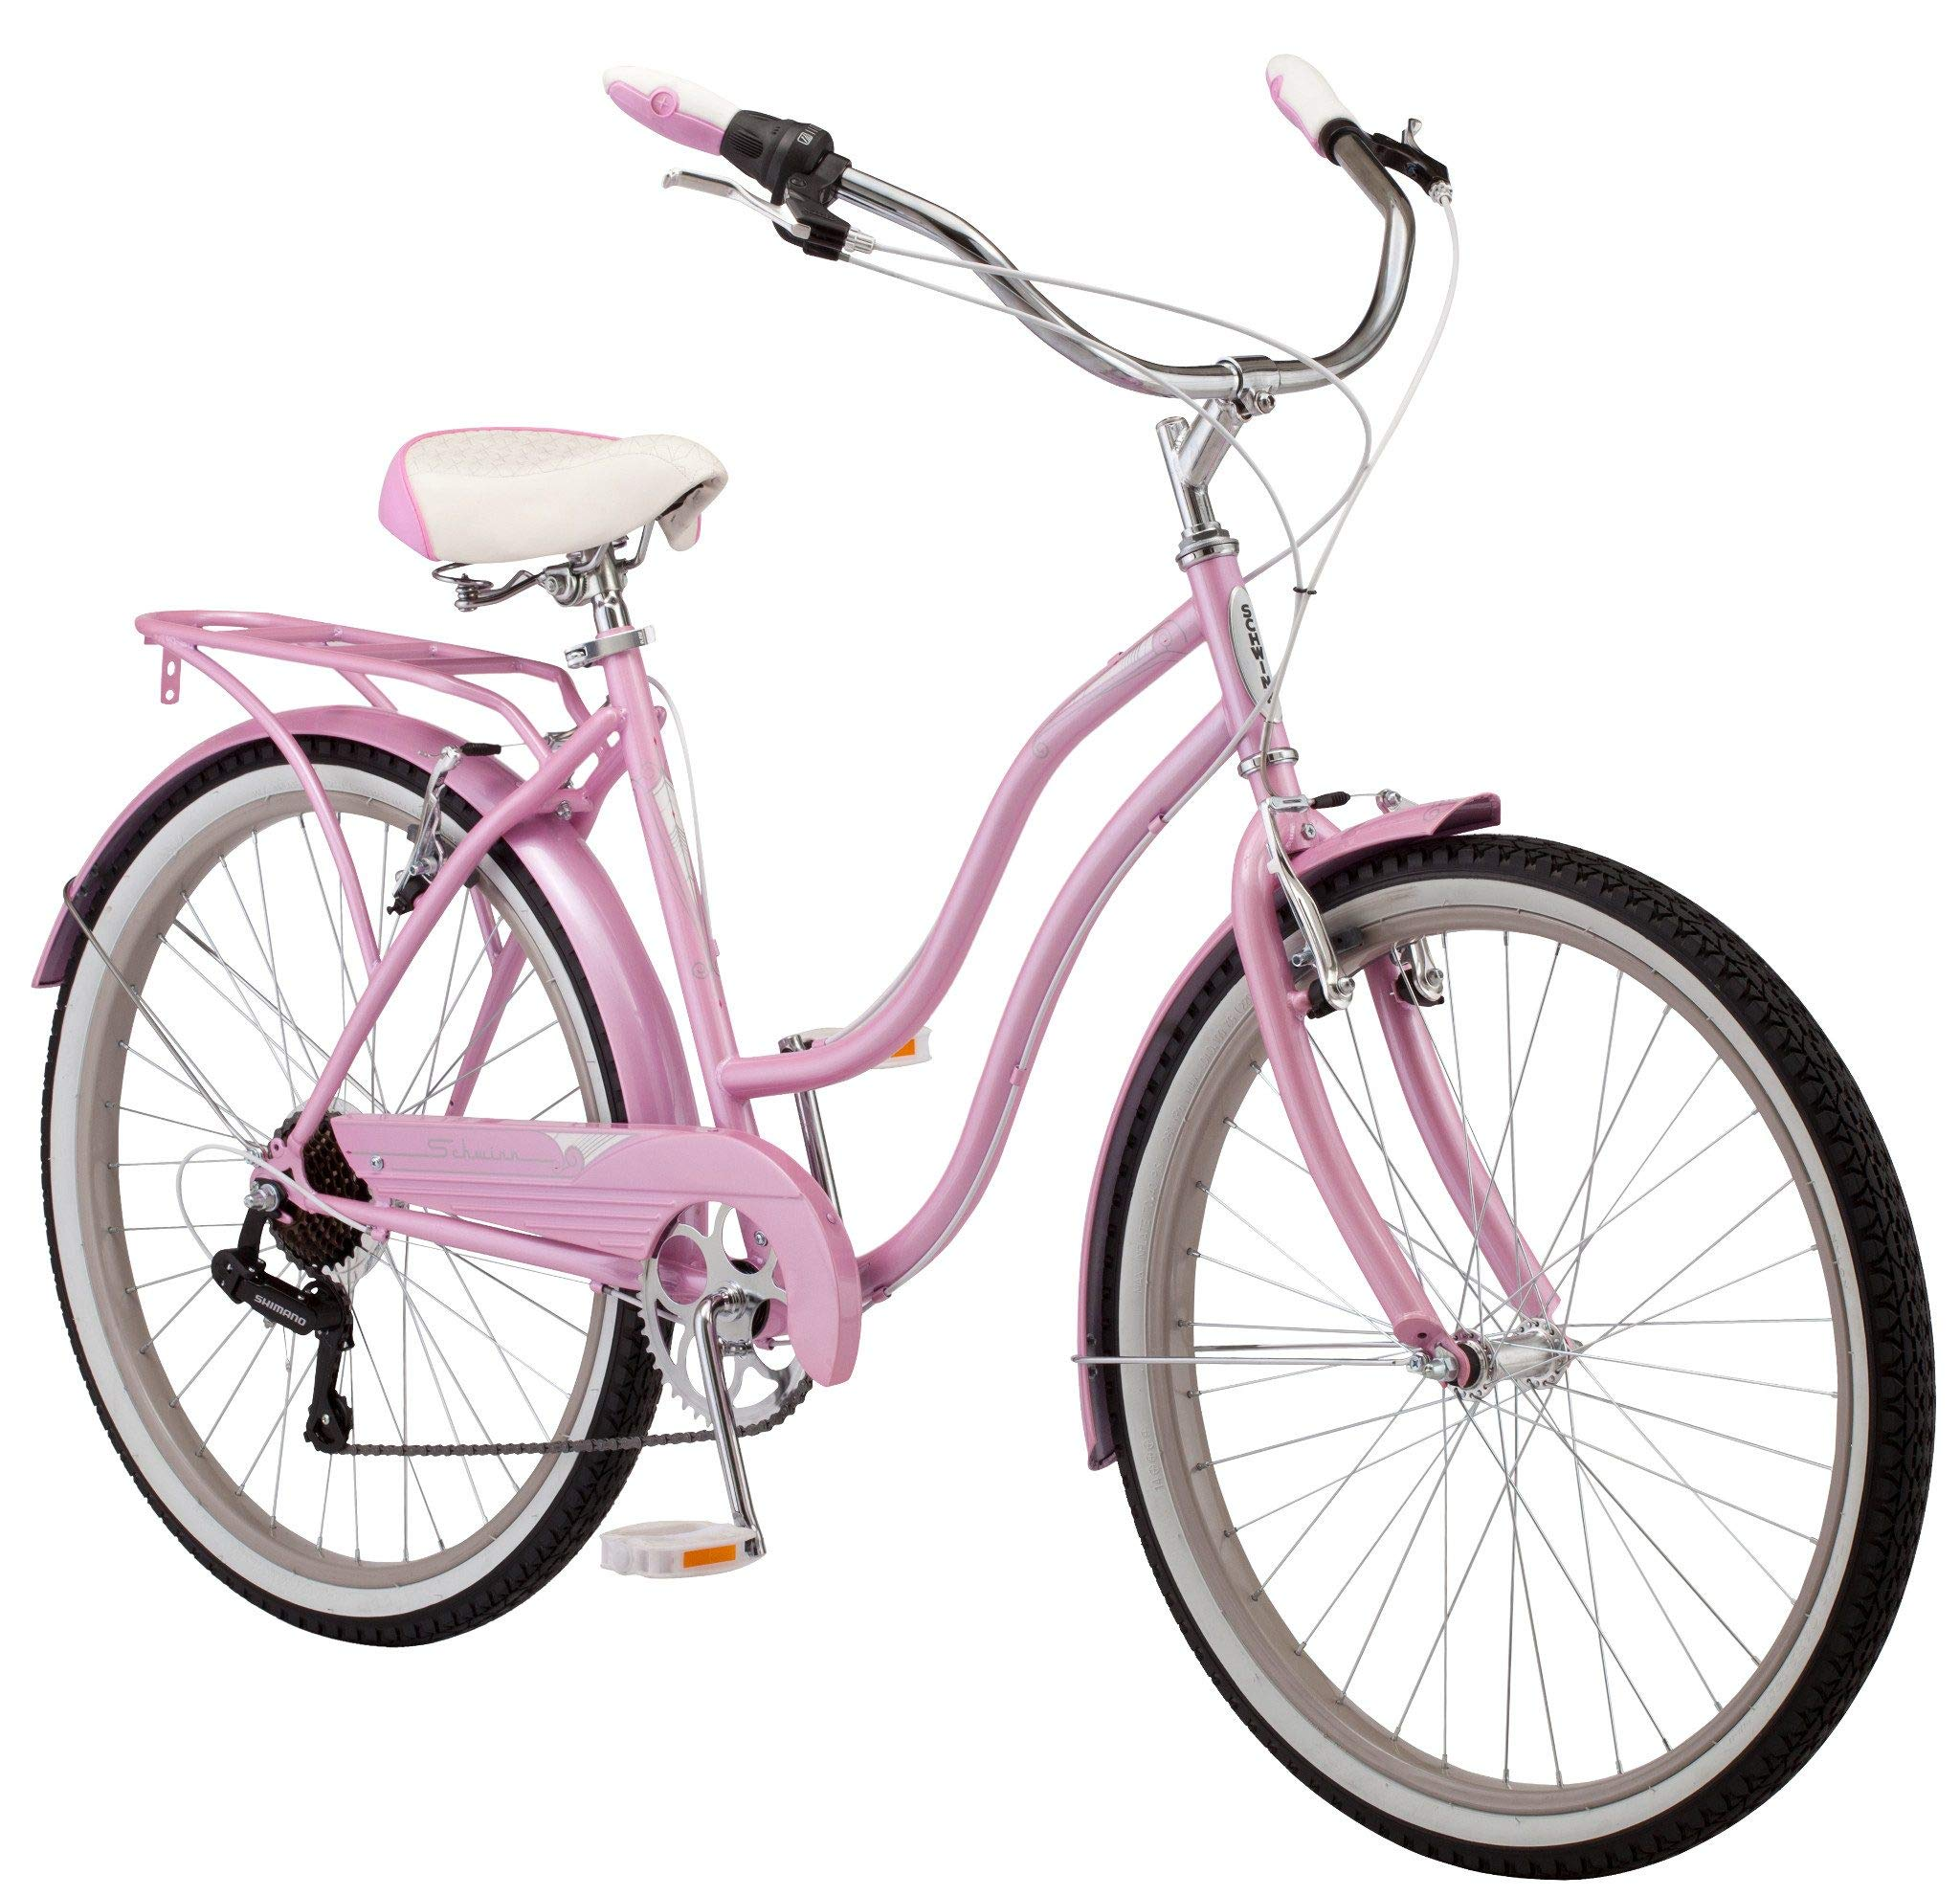 Schwinn Perla Womens Beach Cruiser Bike, 26-Inch Wheels, Multiple Colors